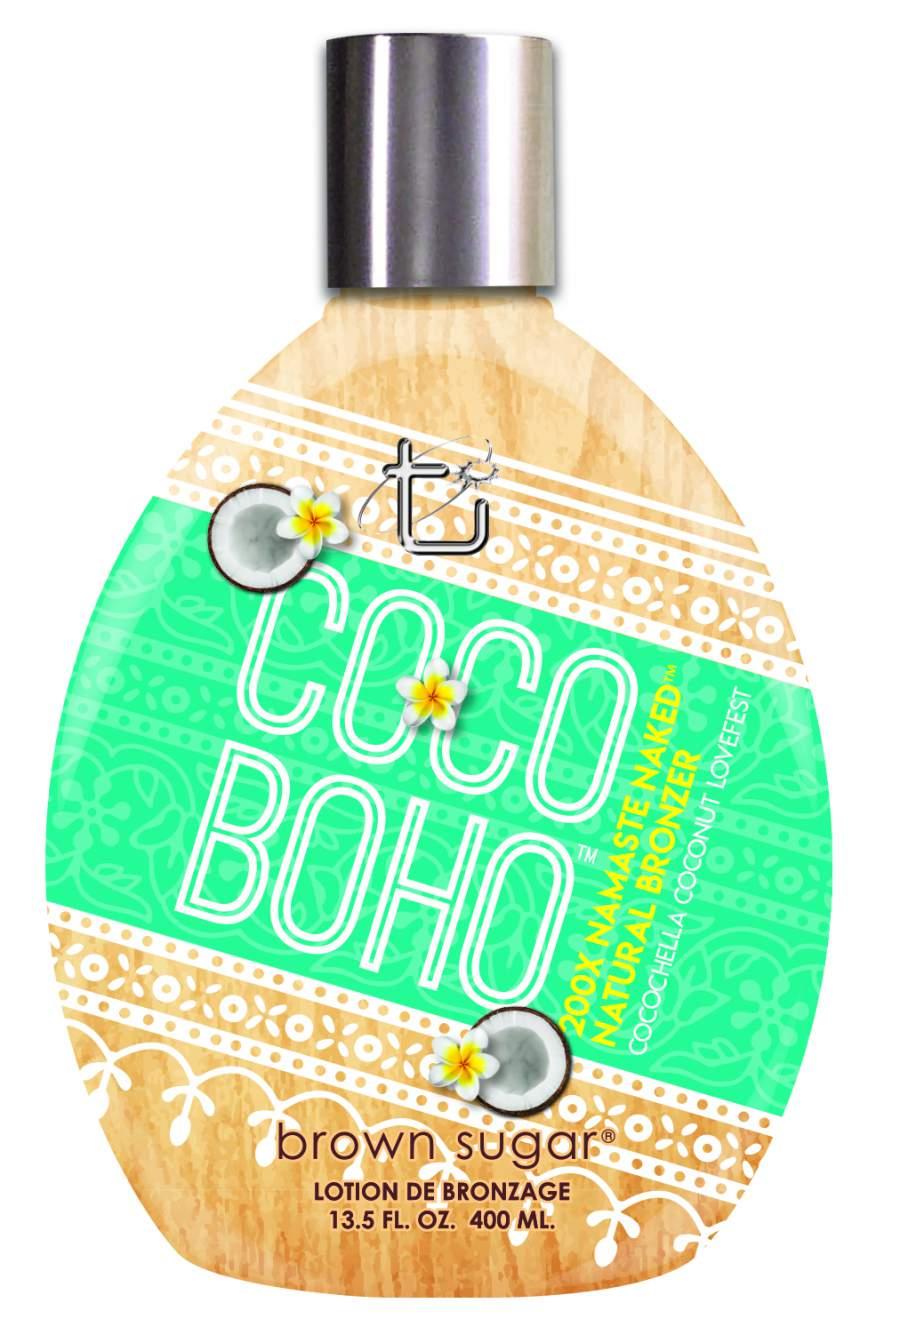 COCO BOHO 200x (400 ml)